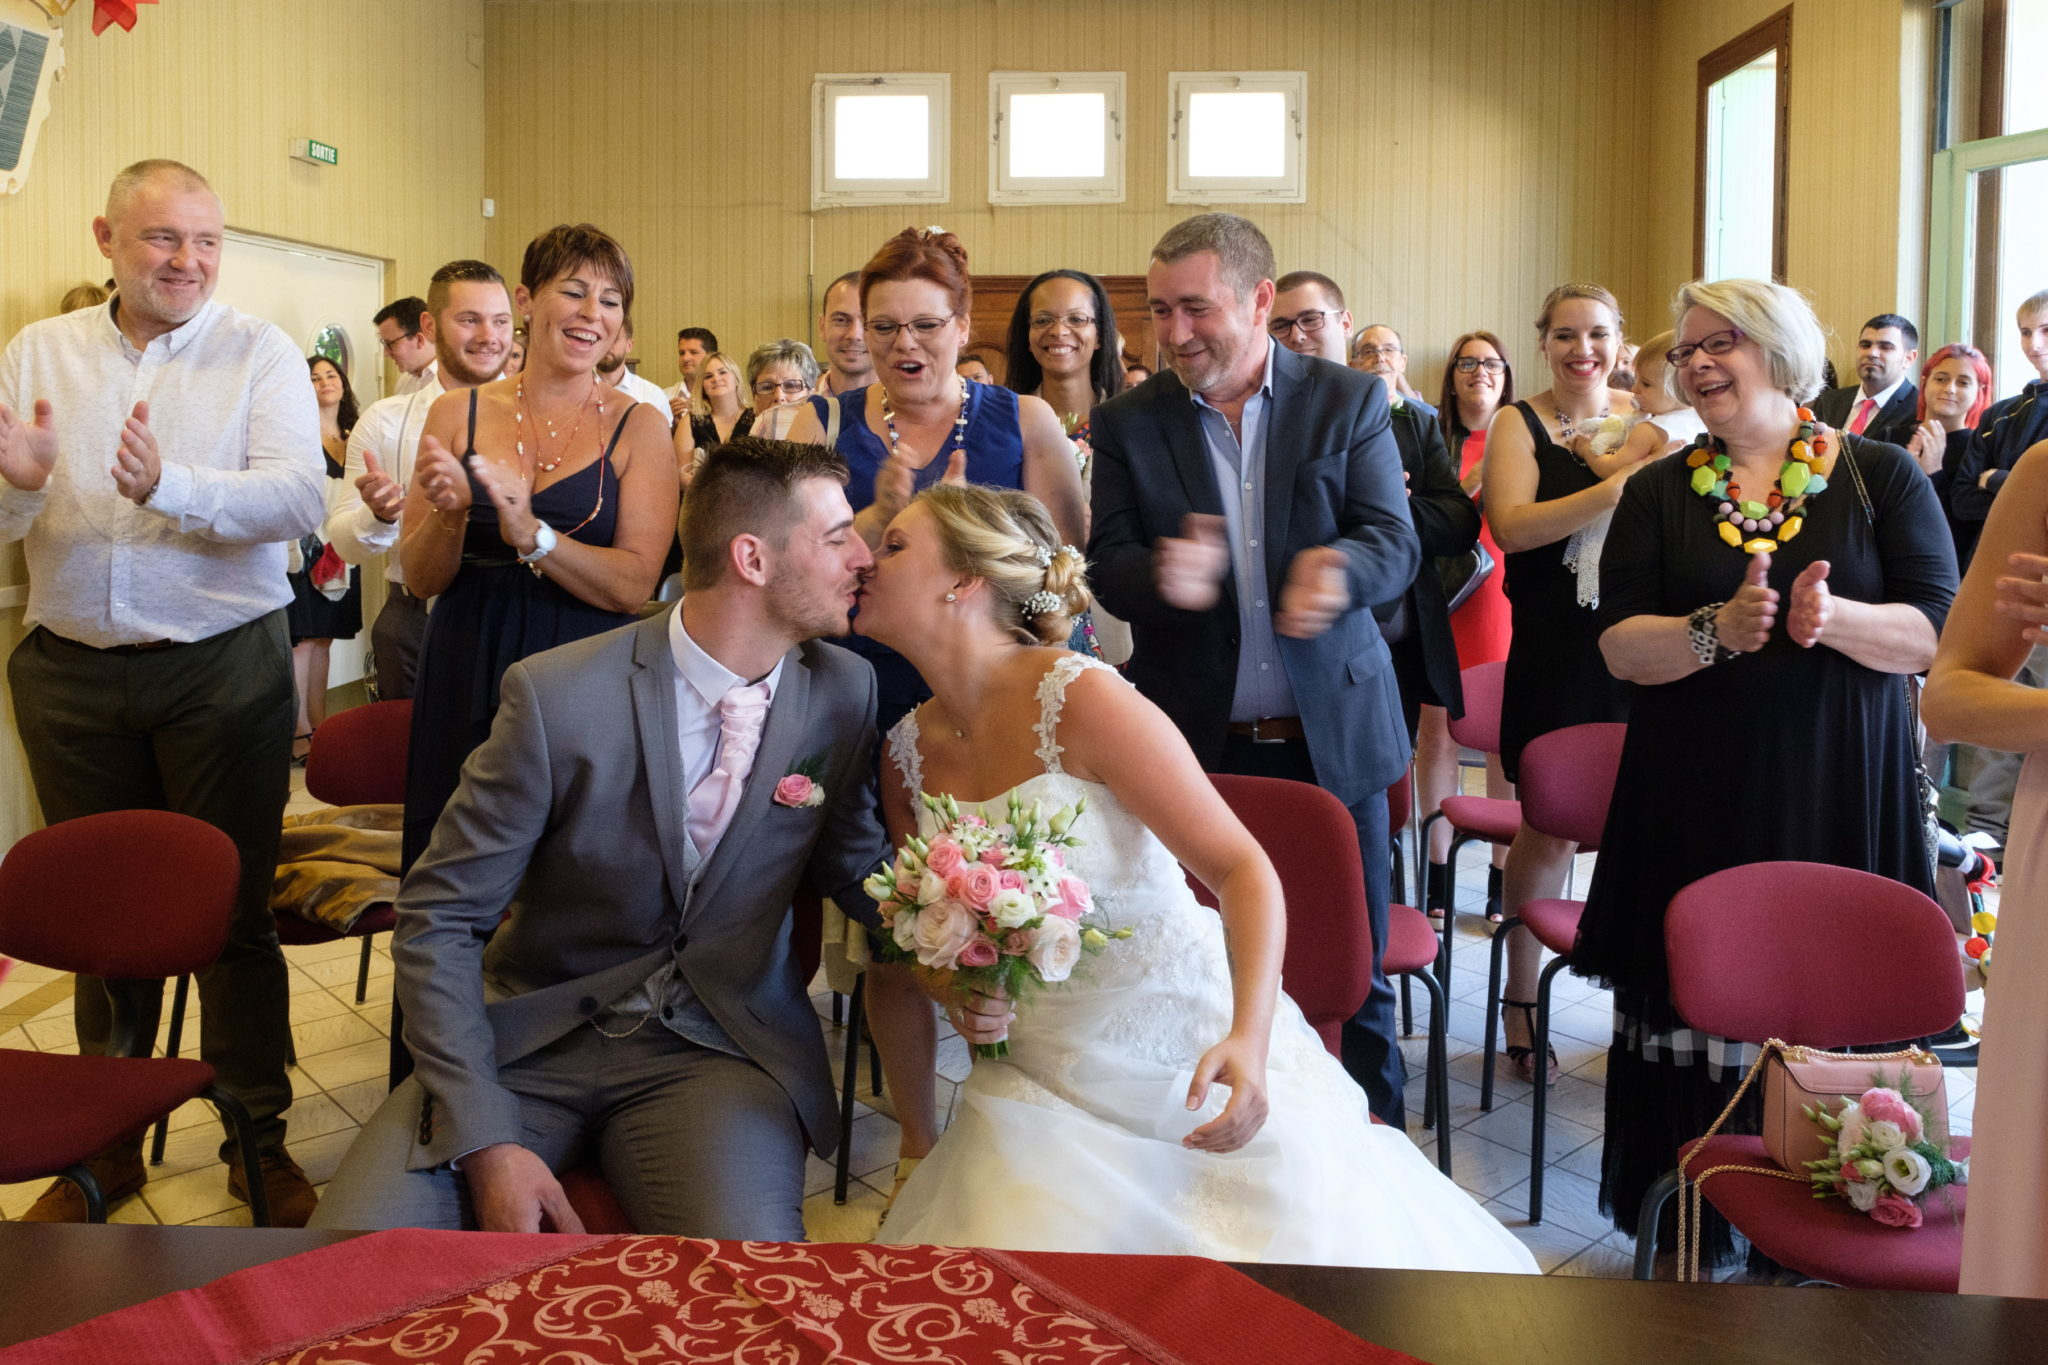 Mariage de Charlotte et Anthony Carbonell